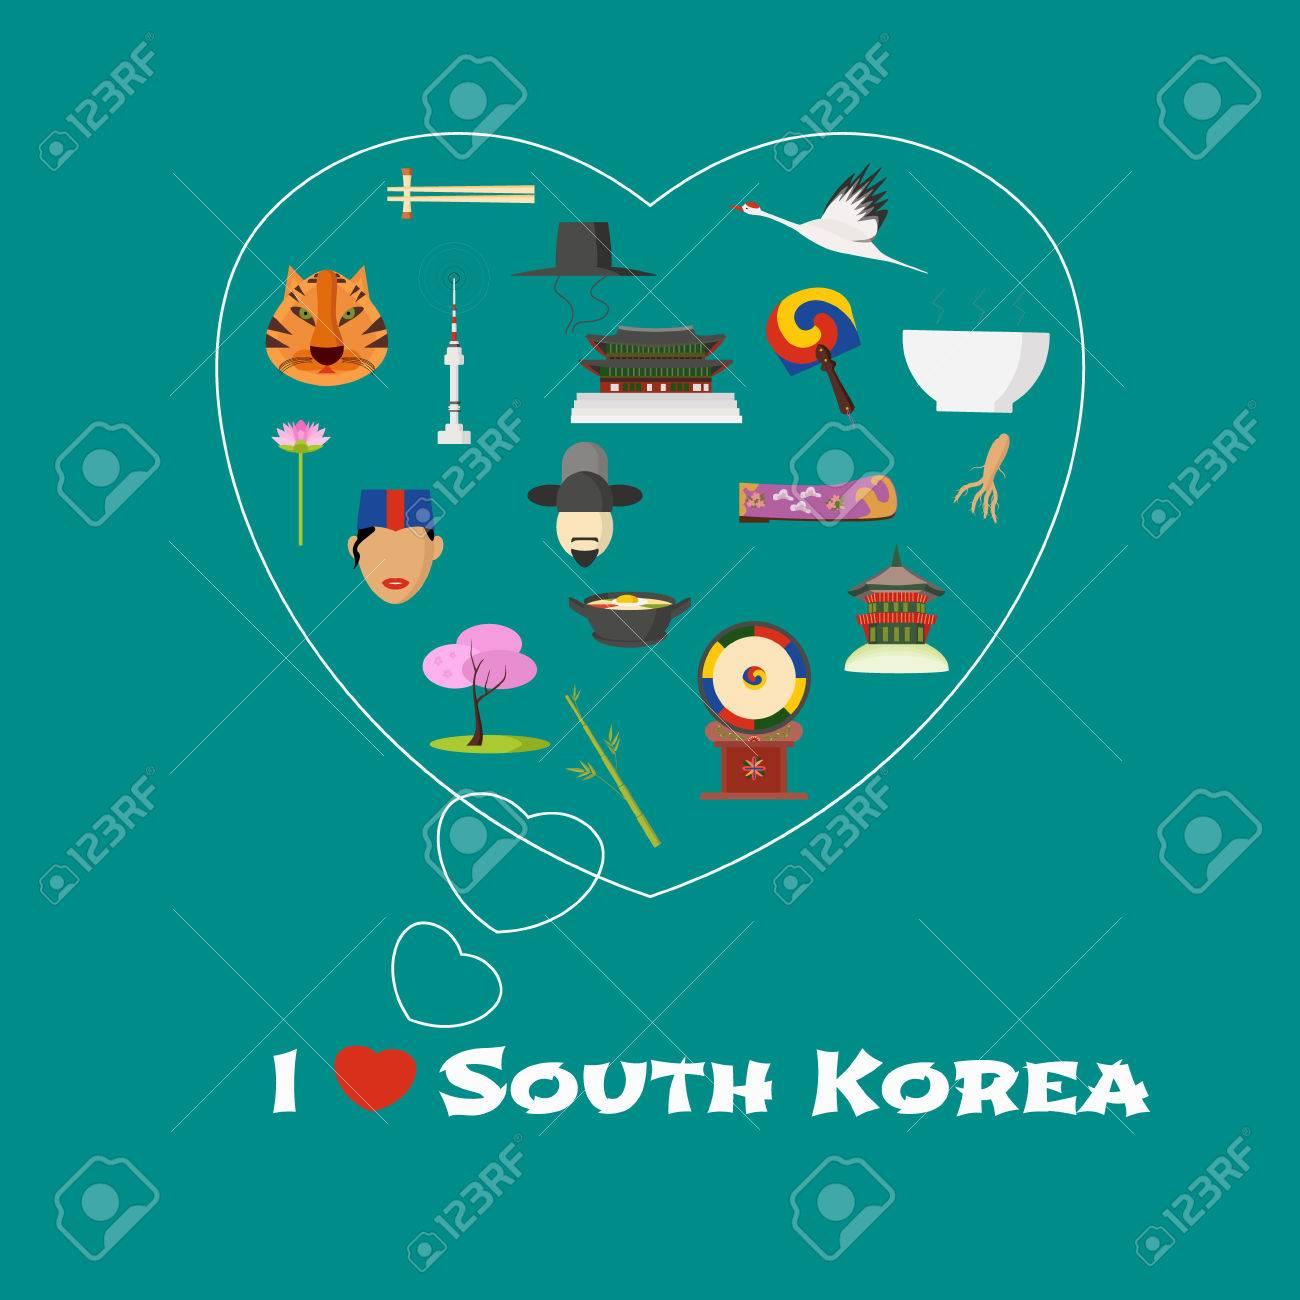 Heart Shape Illustration With I Love South Korea Quote Korean